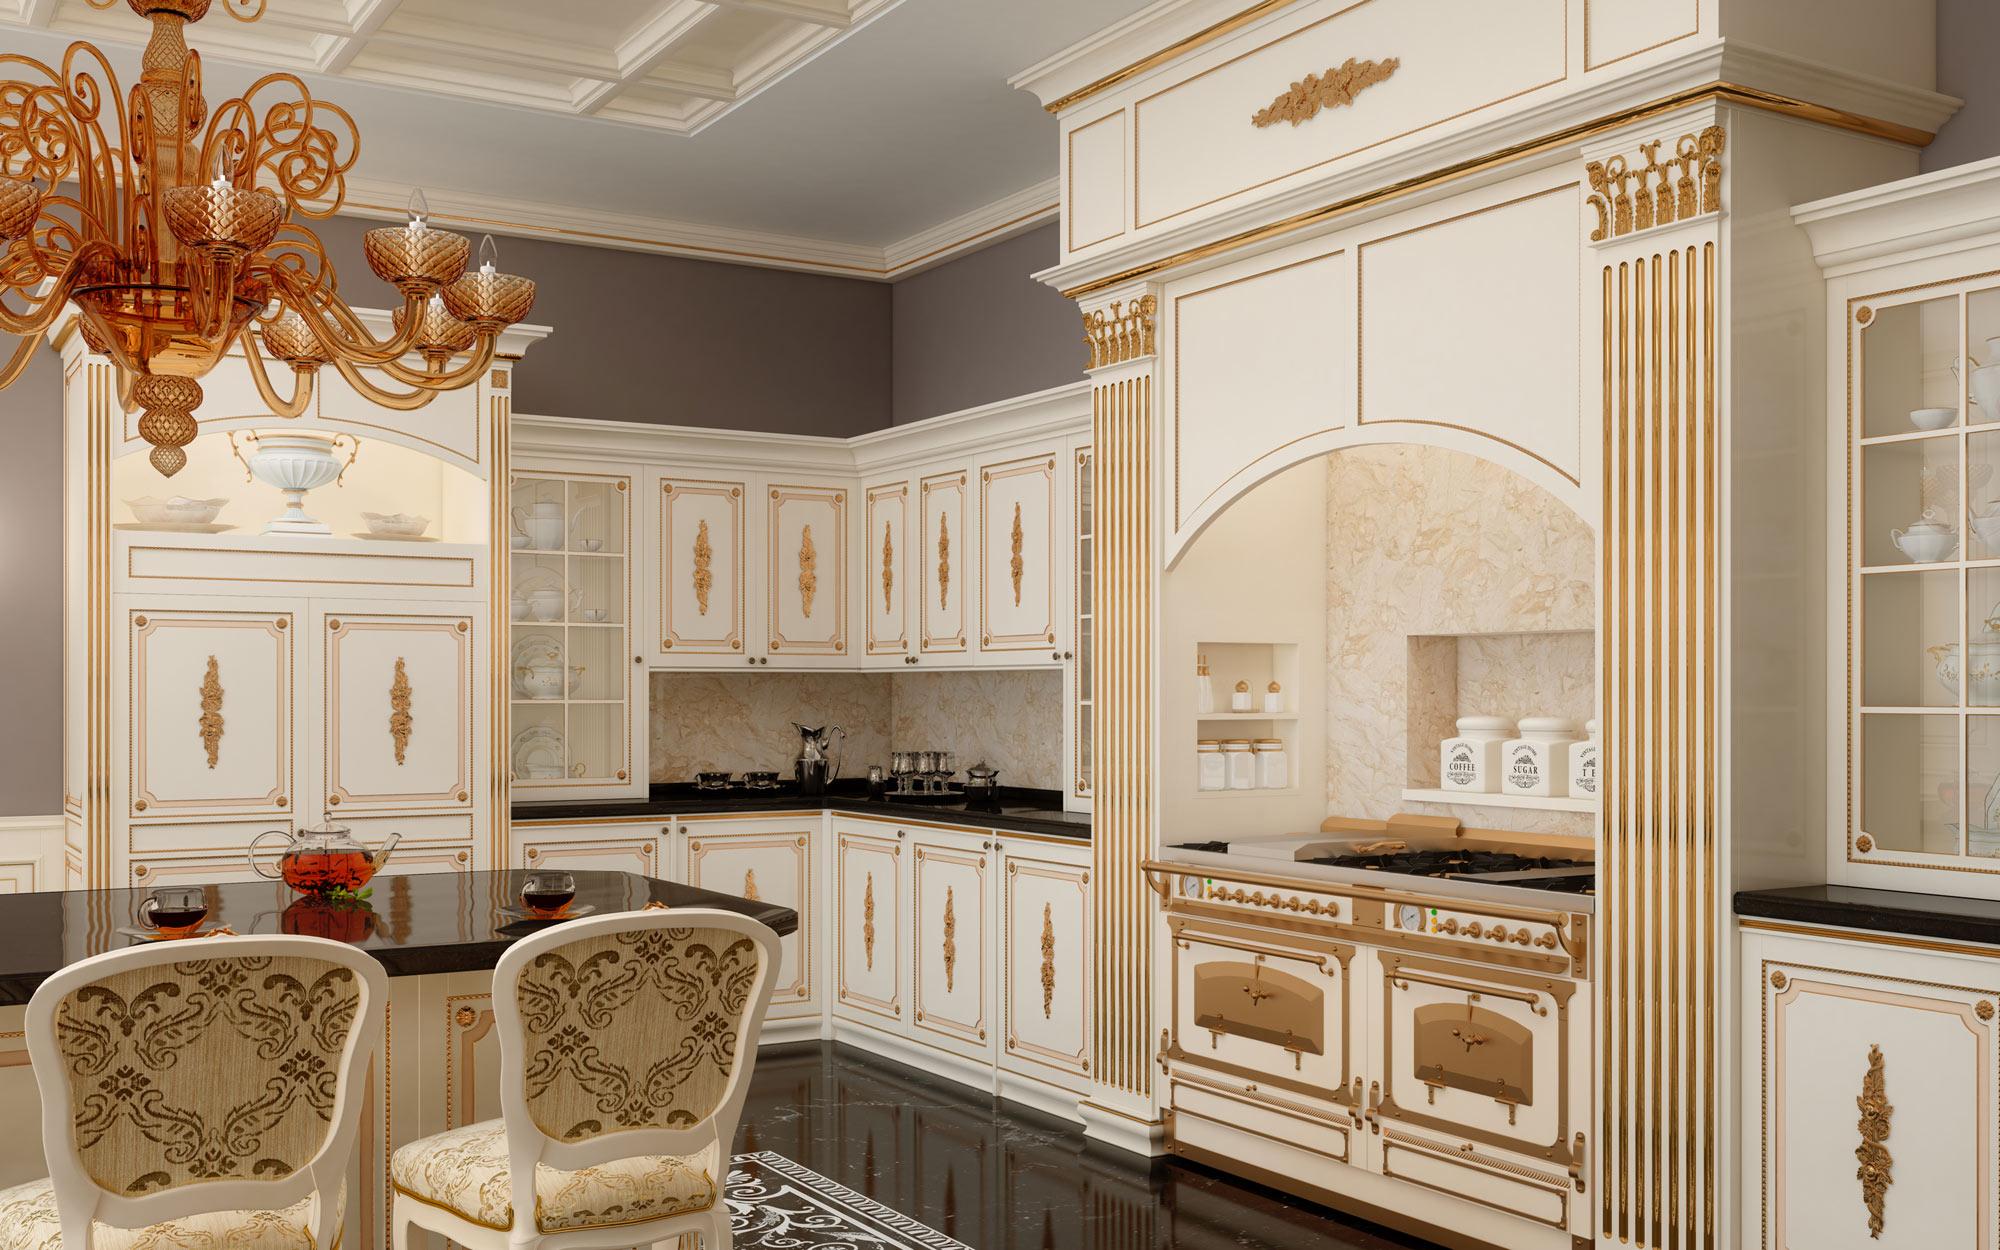 Cucine classiche su misura il lusso entra in cucina - Cucine lussuose moderne ...